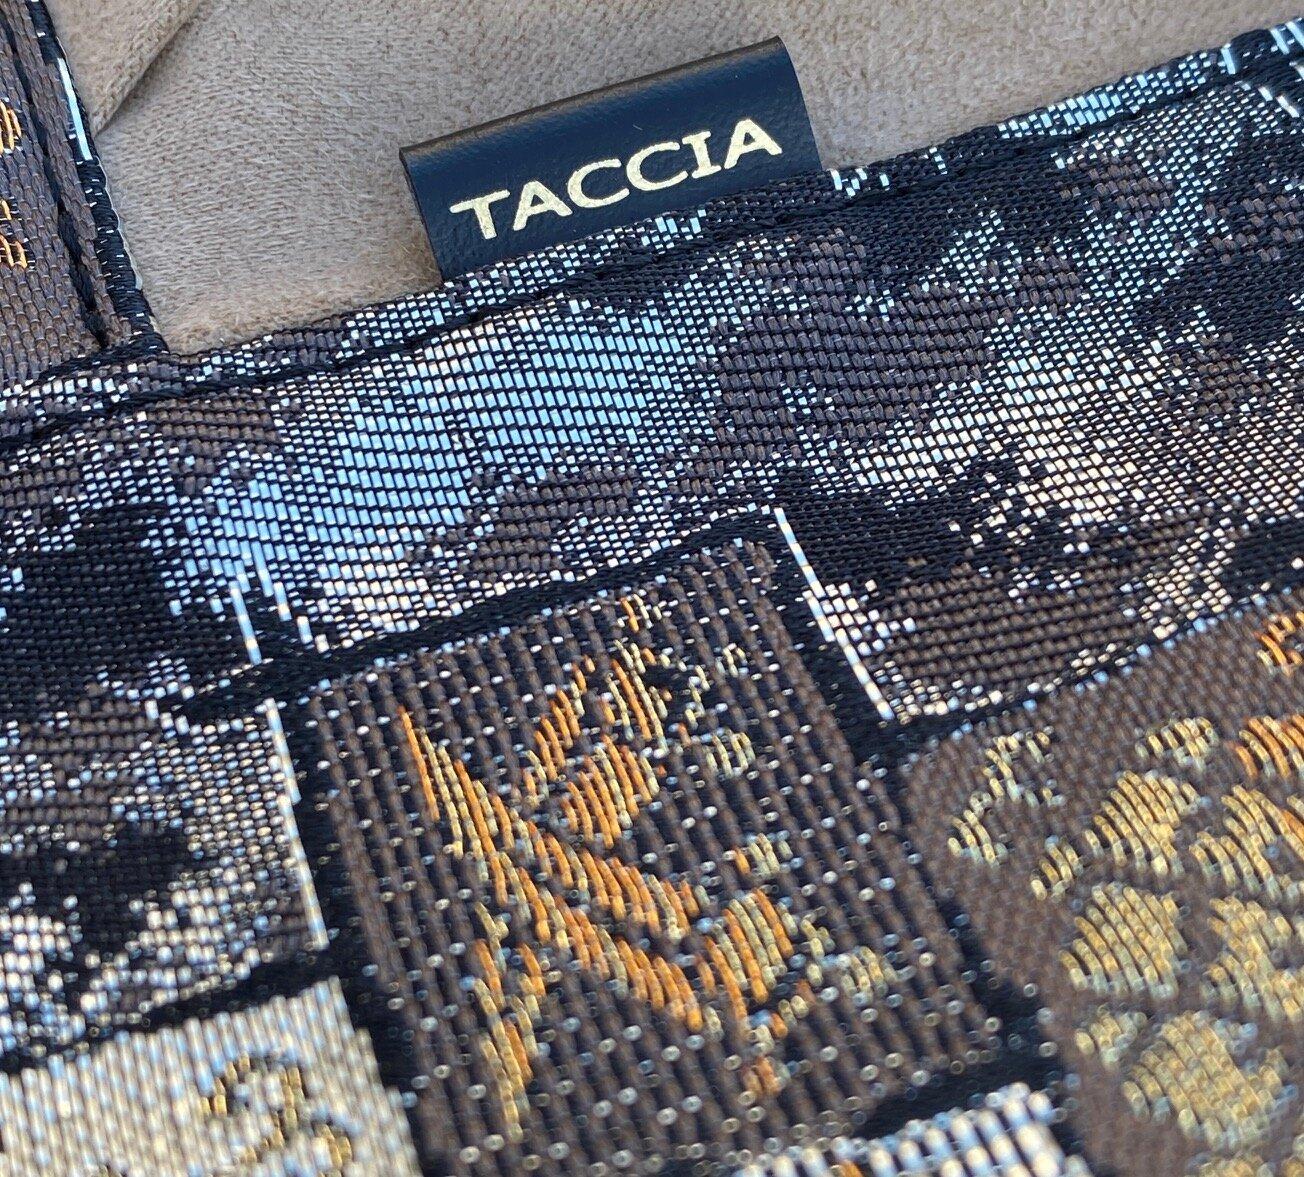 TACCIA - pen-roll - material detail.jpeg